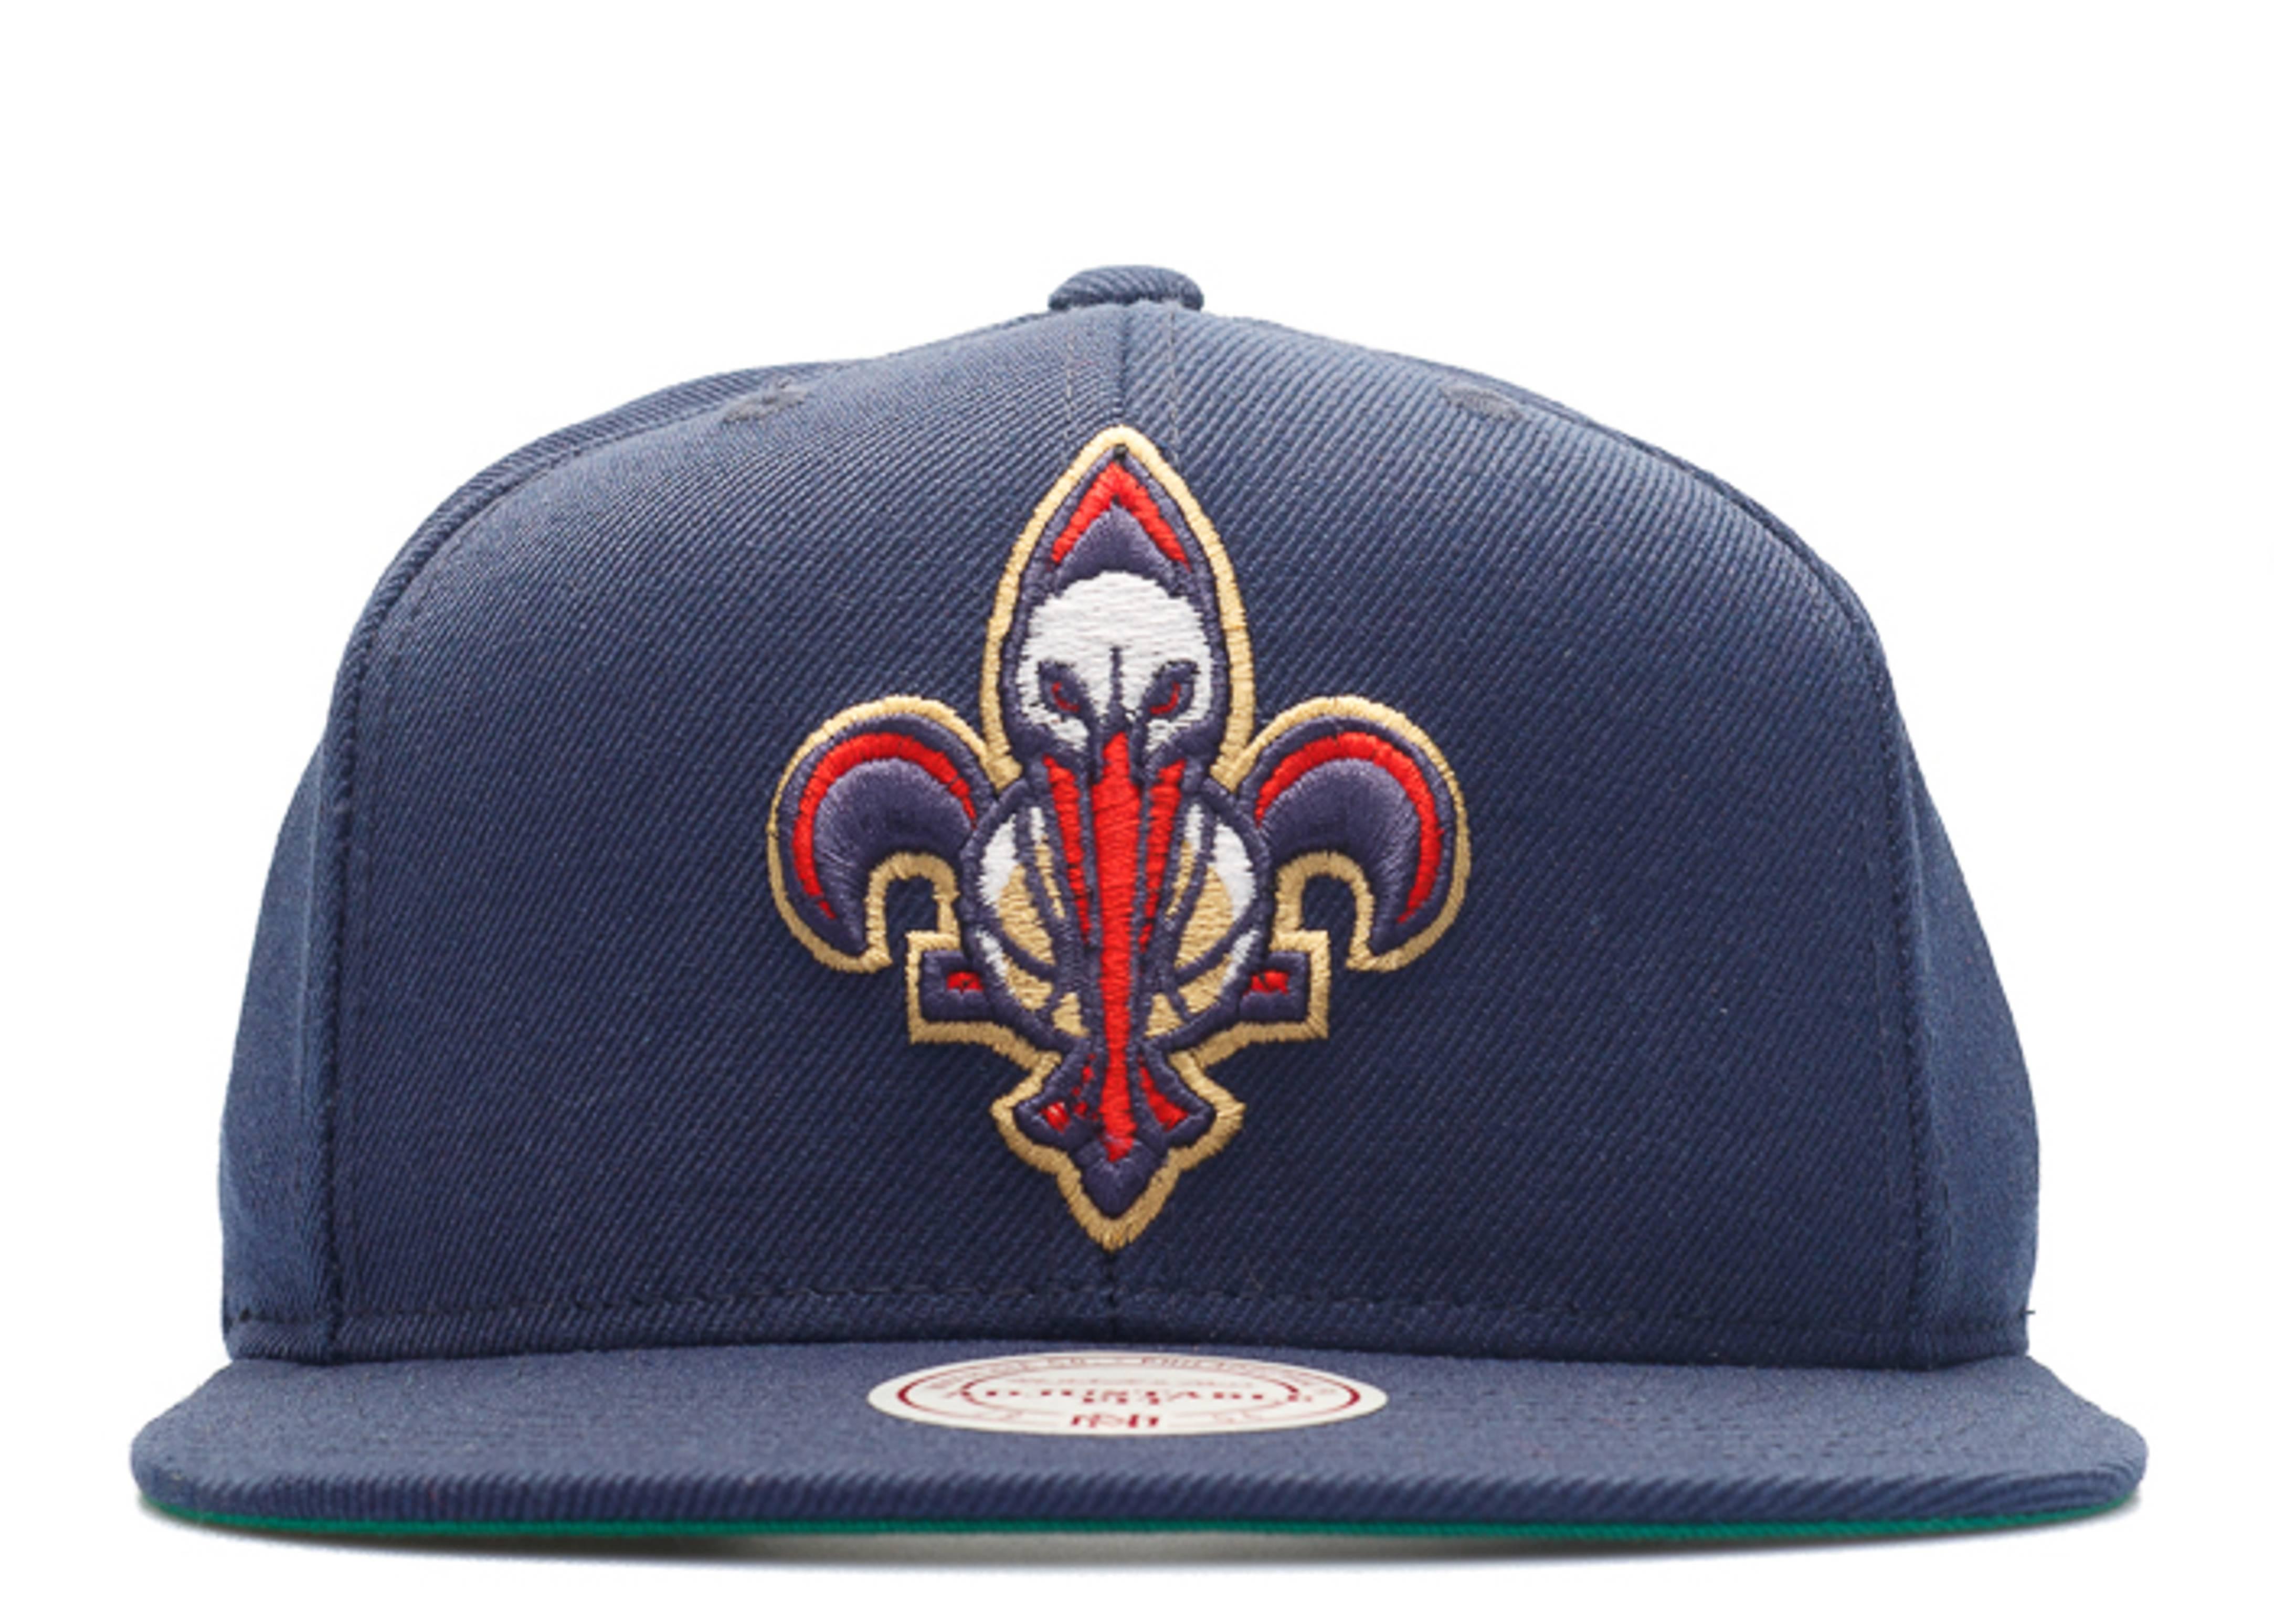 New Orleans Pelicans Snap Back Mitchell Ness Nt78tpc5pelic Navy Gold Wht Rd Flight Club